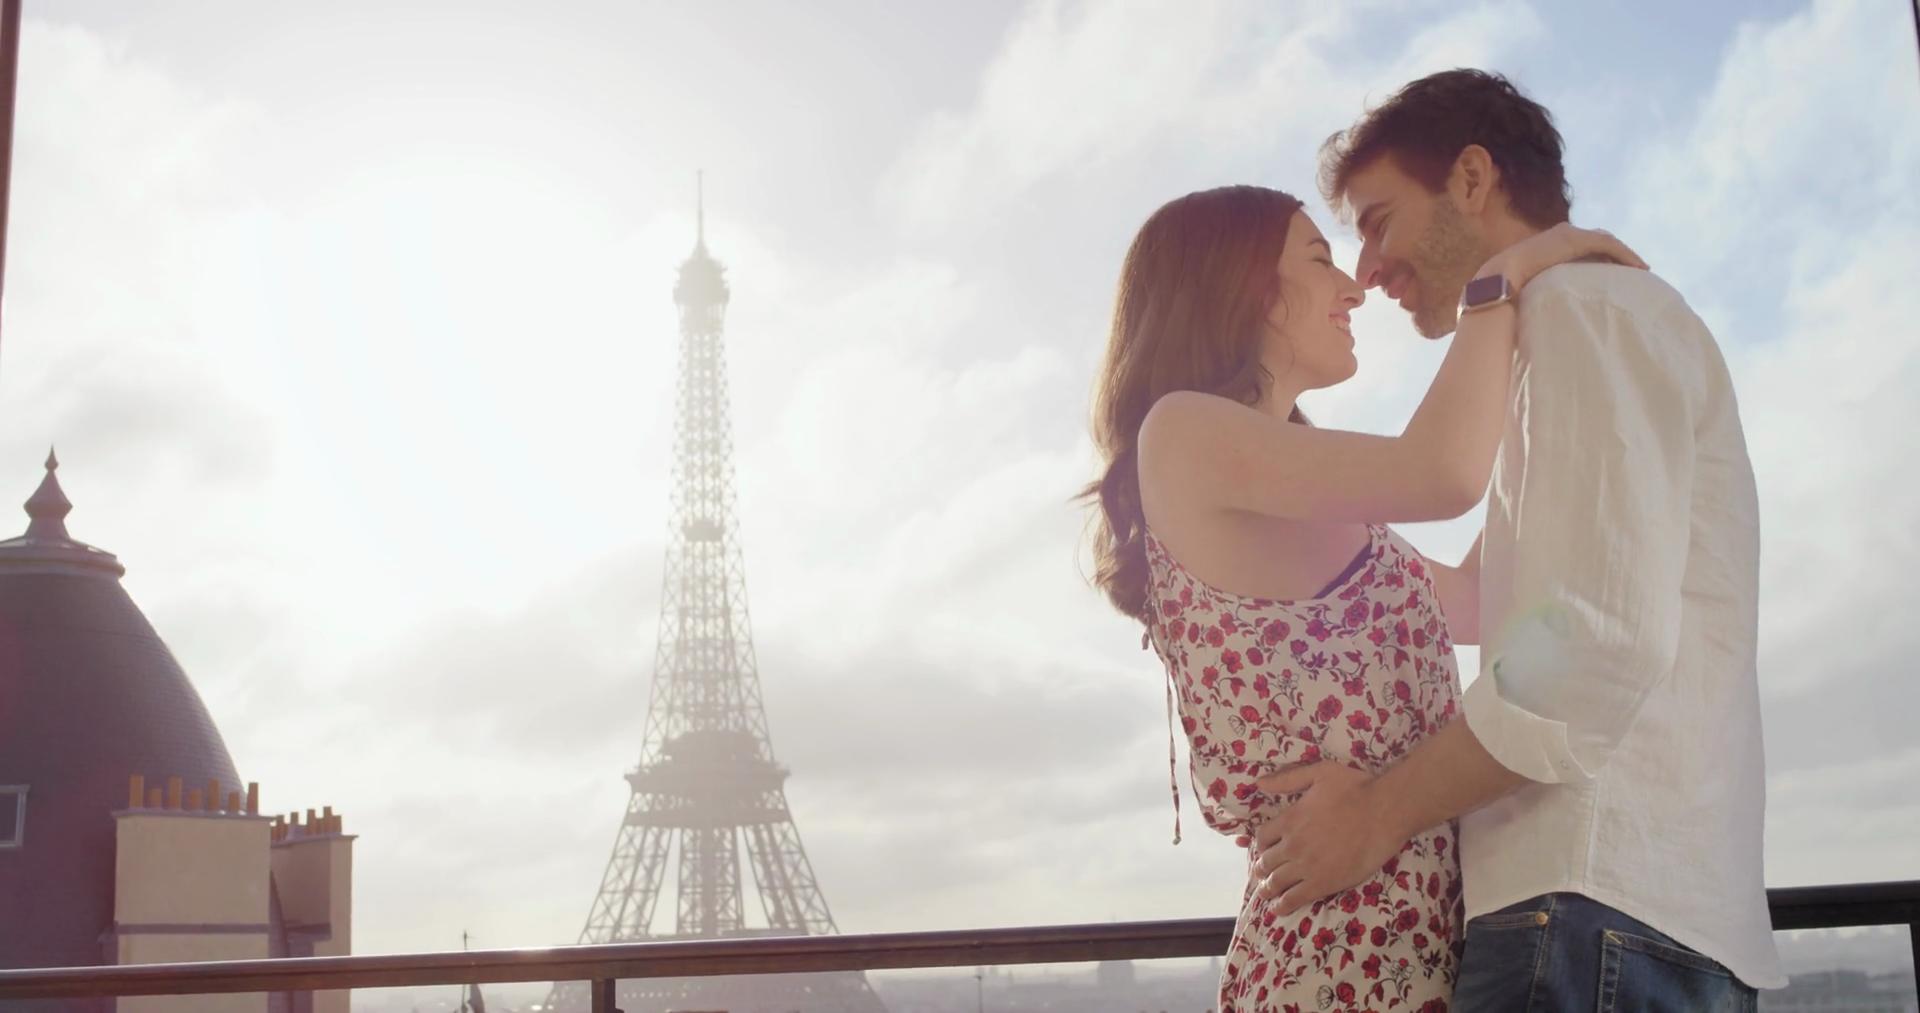 videoblocks-romantic-couple-in-paris-eiffel-tower-embrace-kissing-honeymoon-enjoying-european-summer-holiday-travel-vacation-adventure_slmvy-k4ox_thumbnail-full01